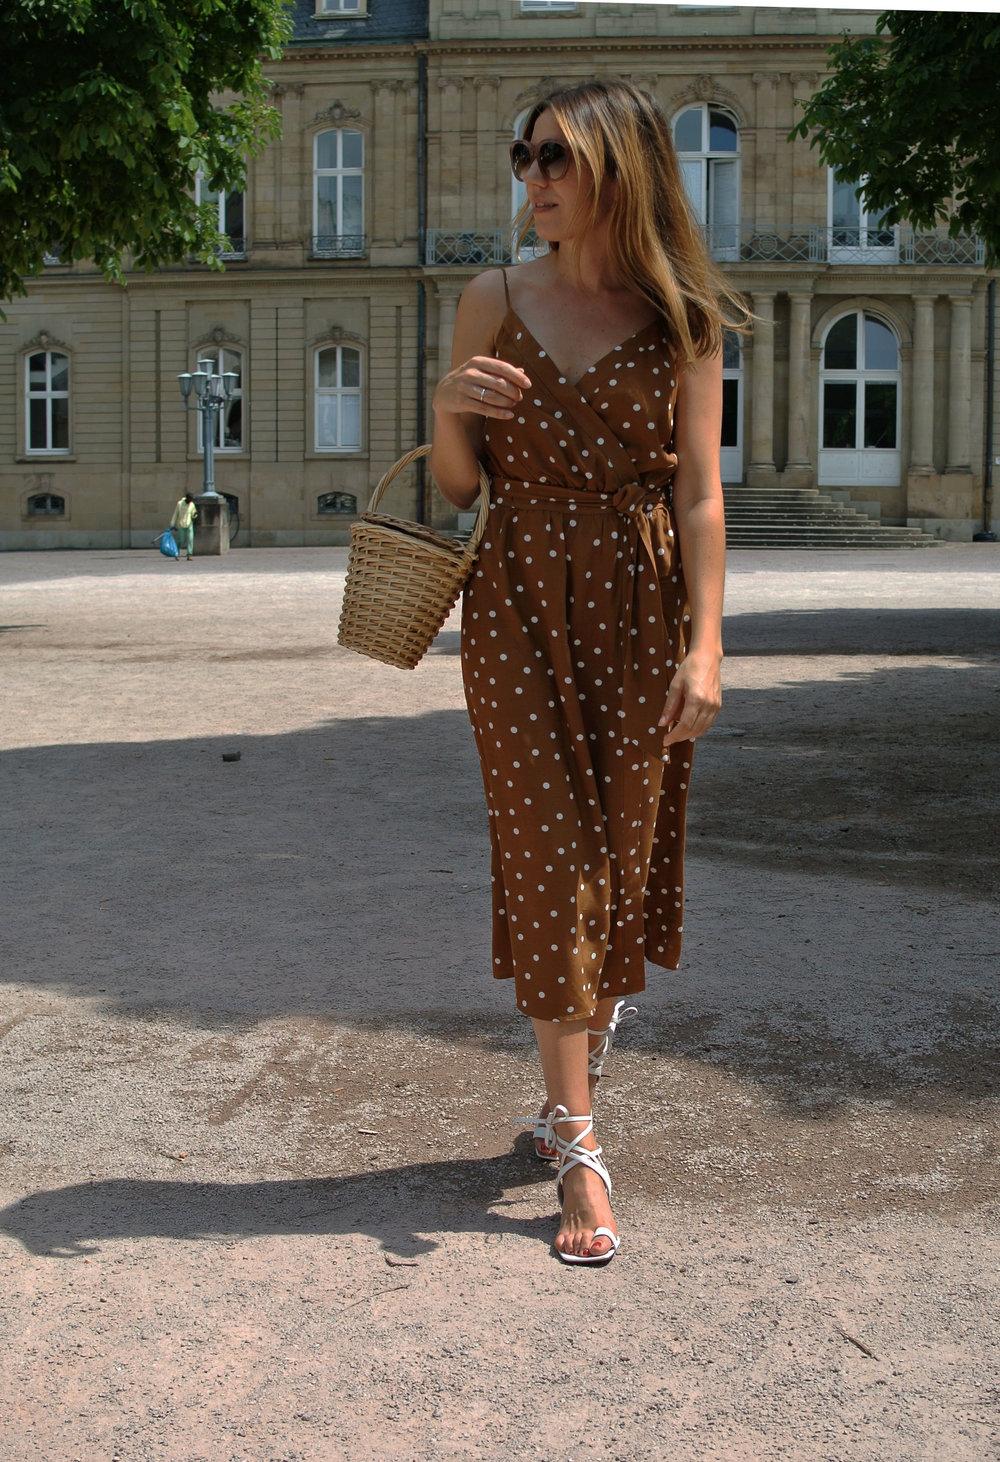 polka dot dress 2.jpg